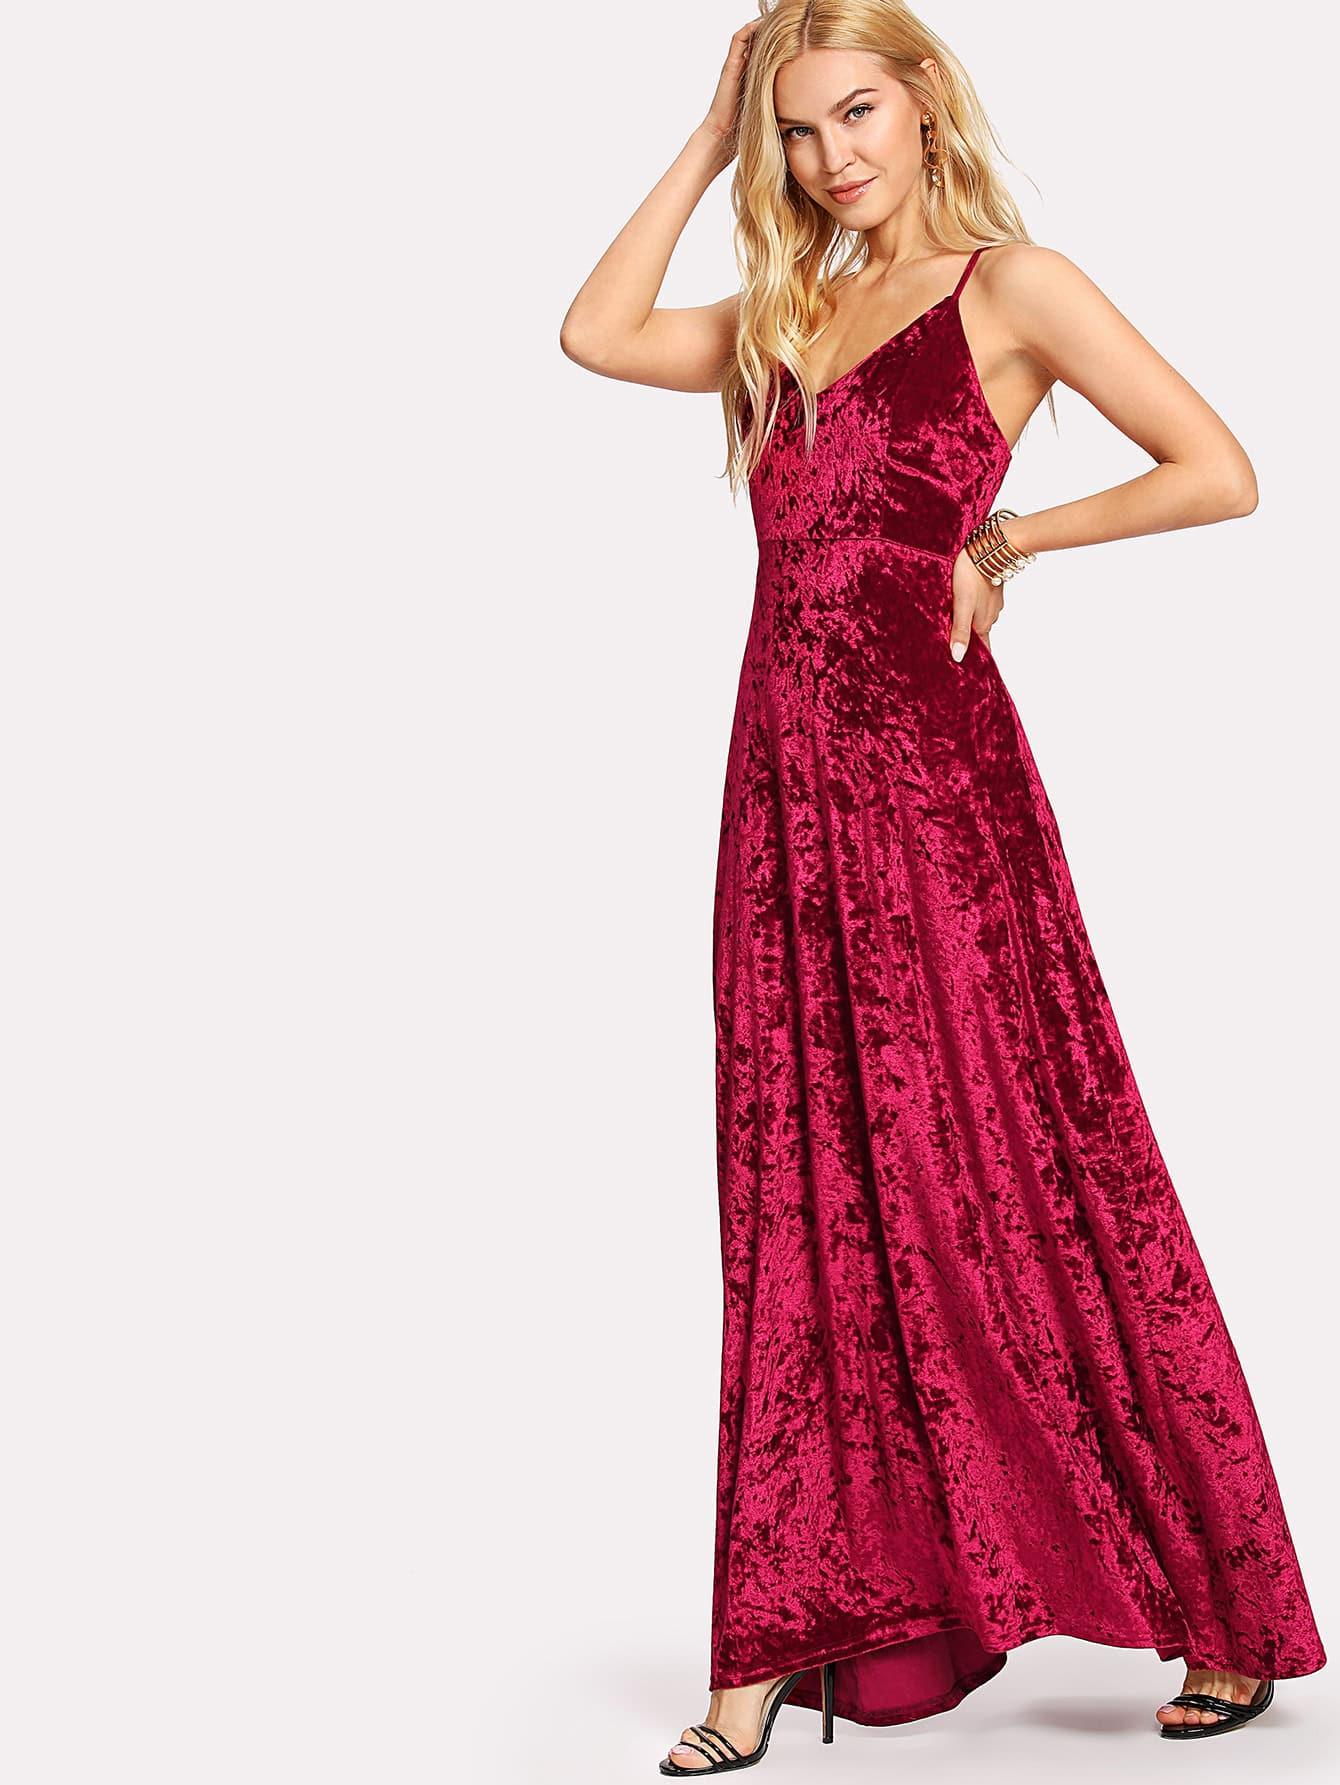 Lace Up Back Crushed Velvet Cami Dress cami velvet casual maxi dress